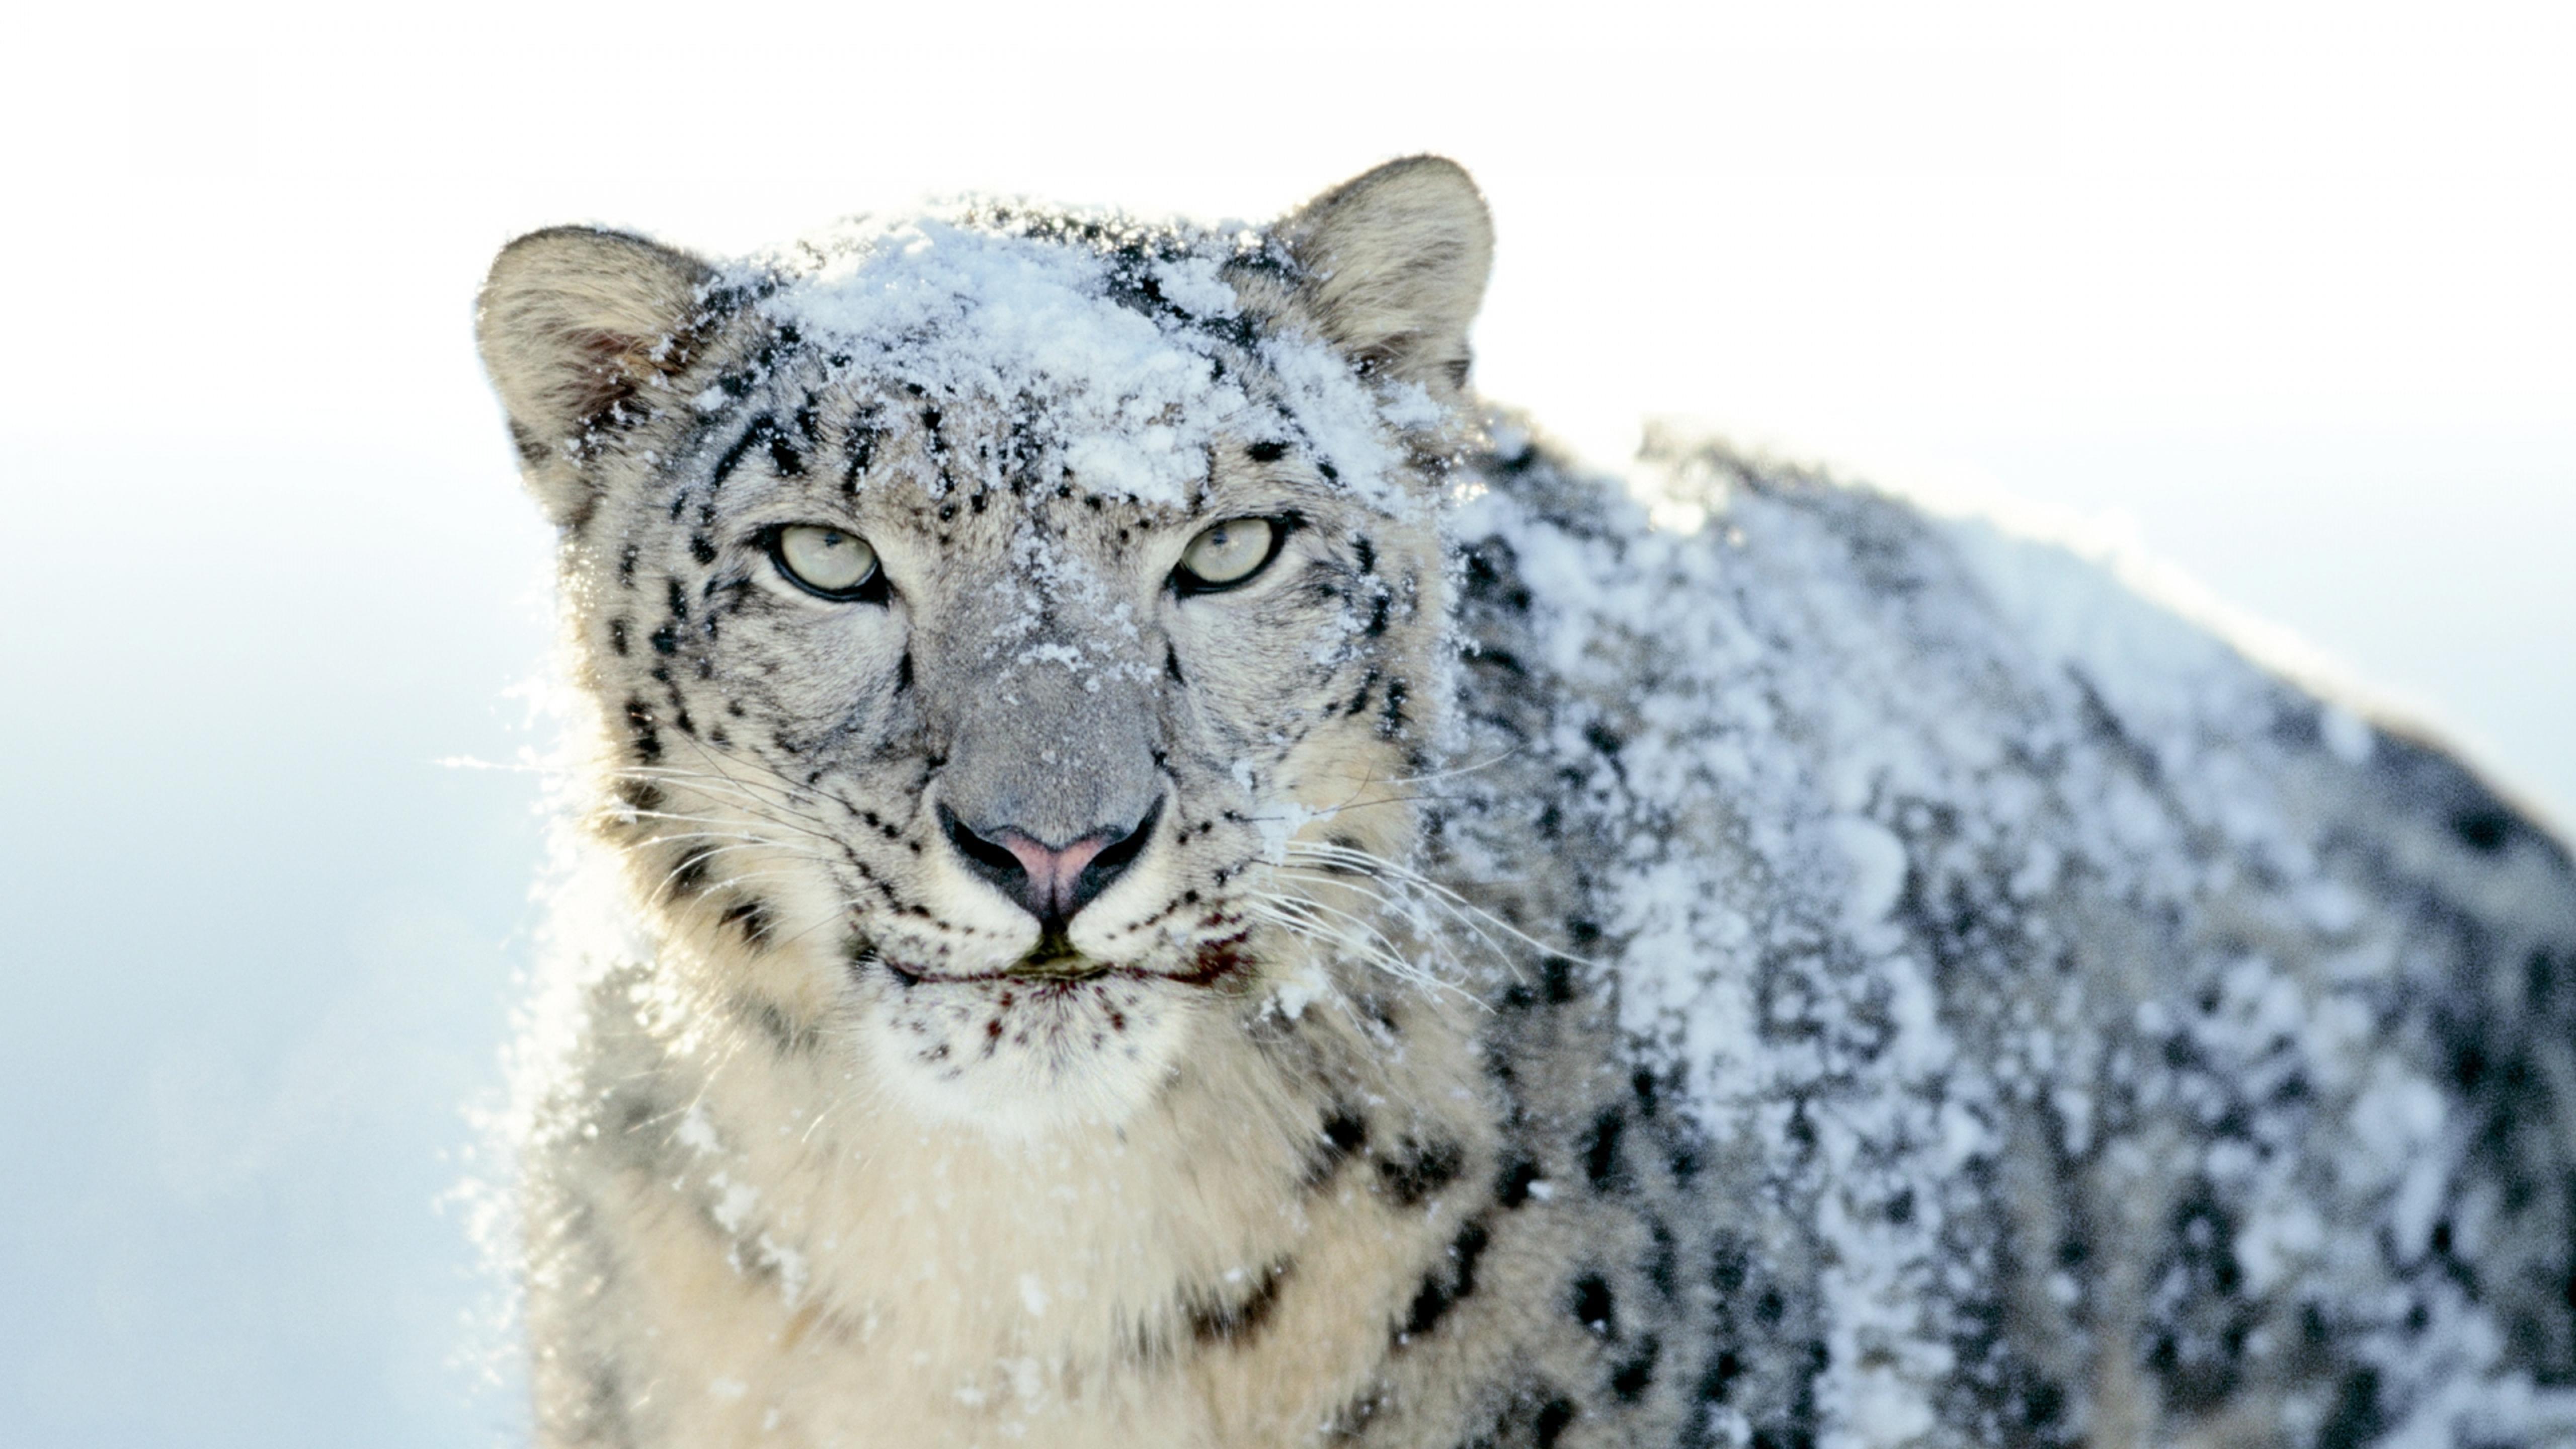 Snow on a furious Siberian tiger - HD wallpaper